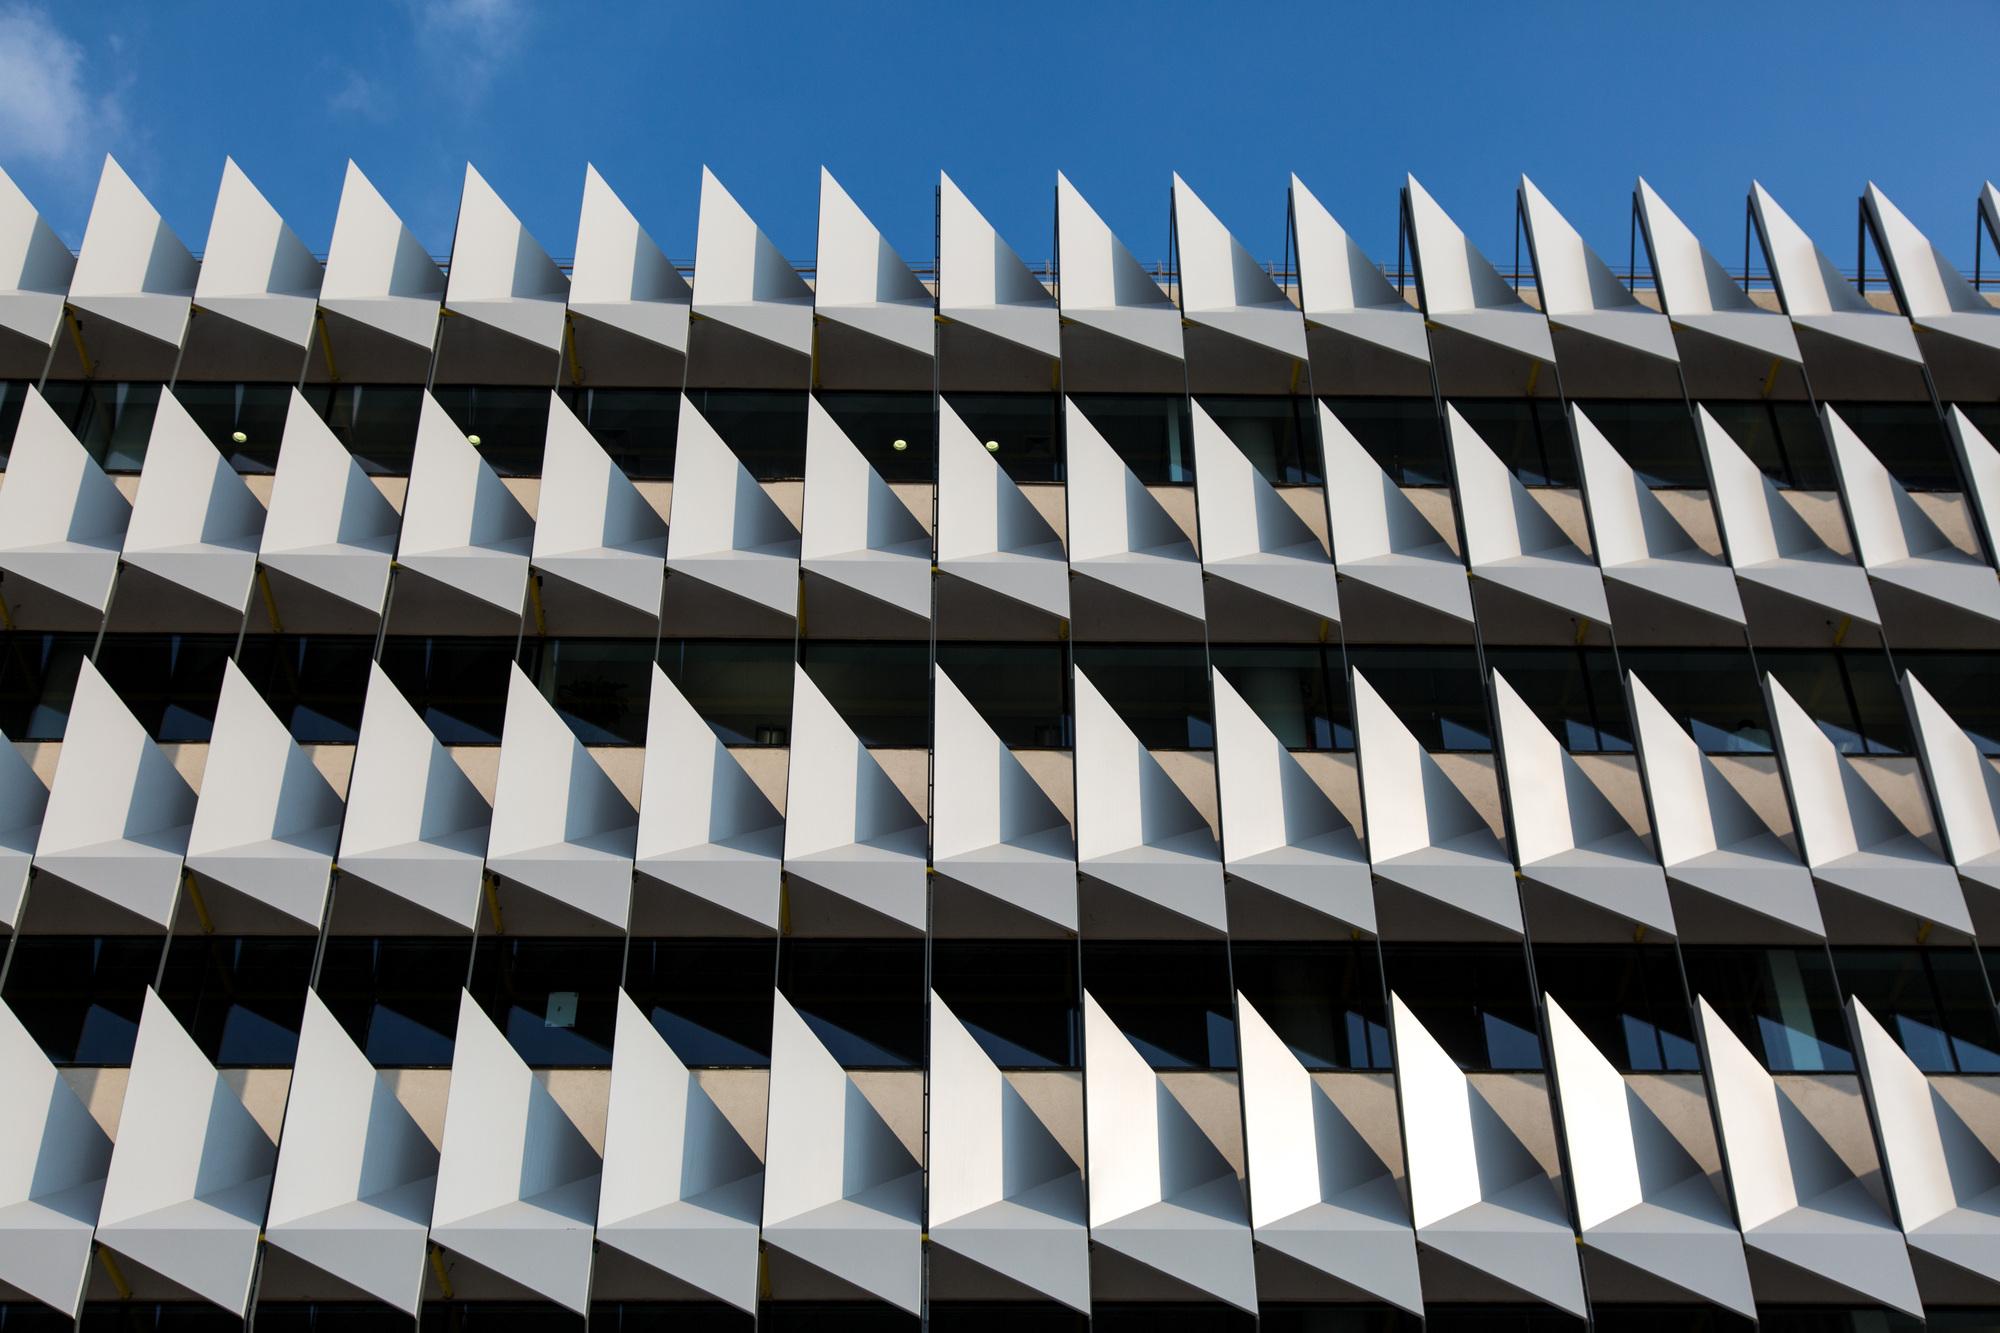 External shading adopted for façade design for Siemens Building in Masdar City